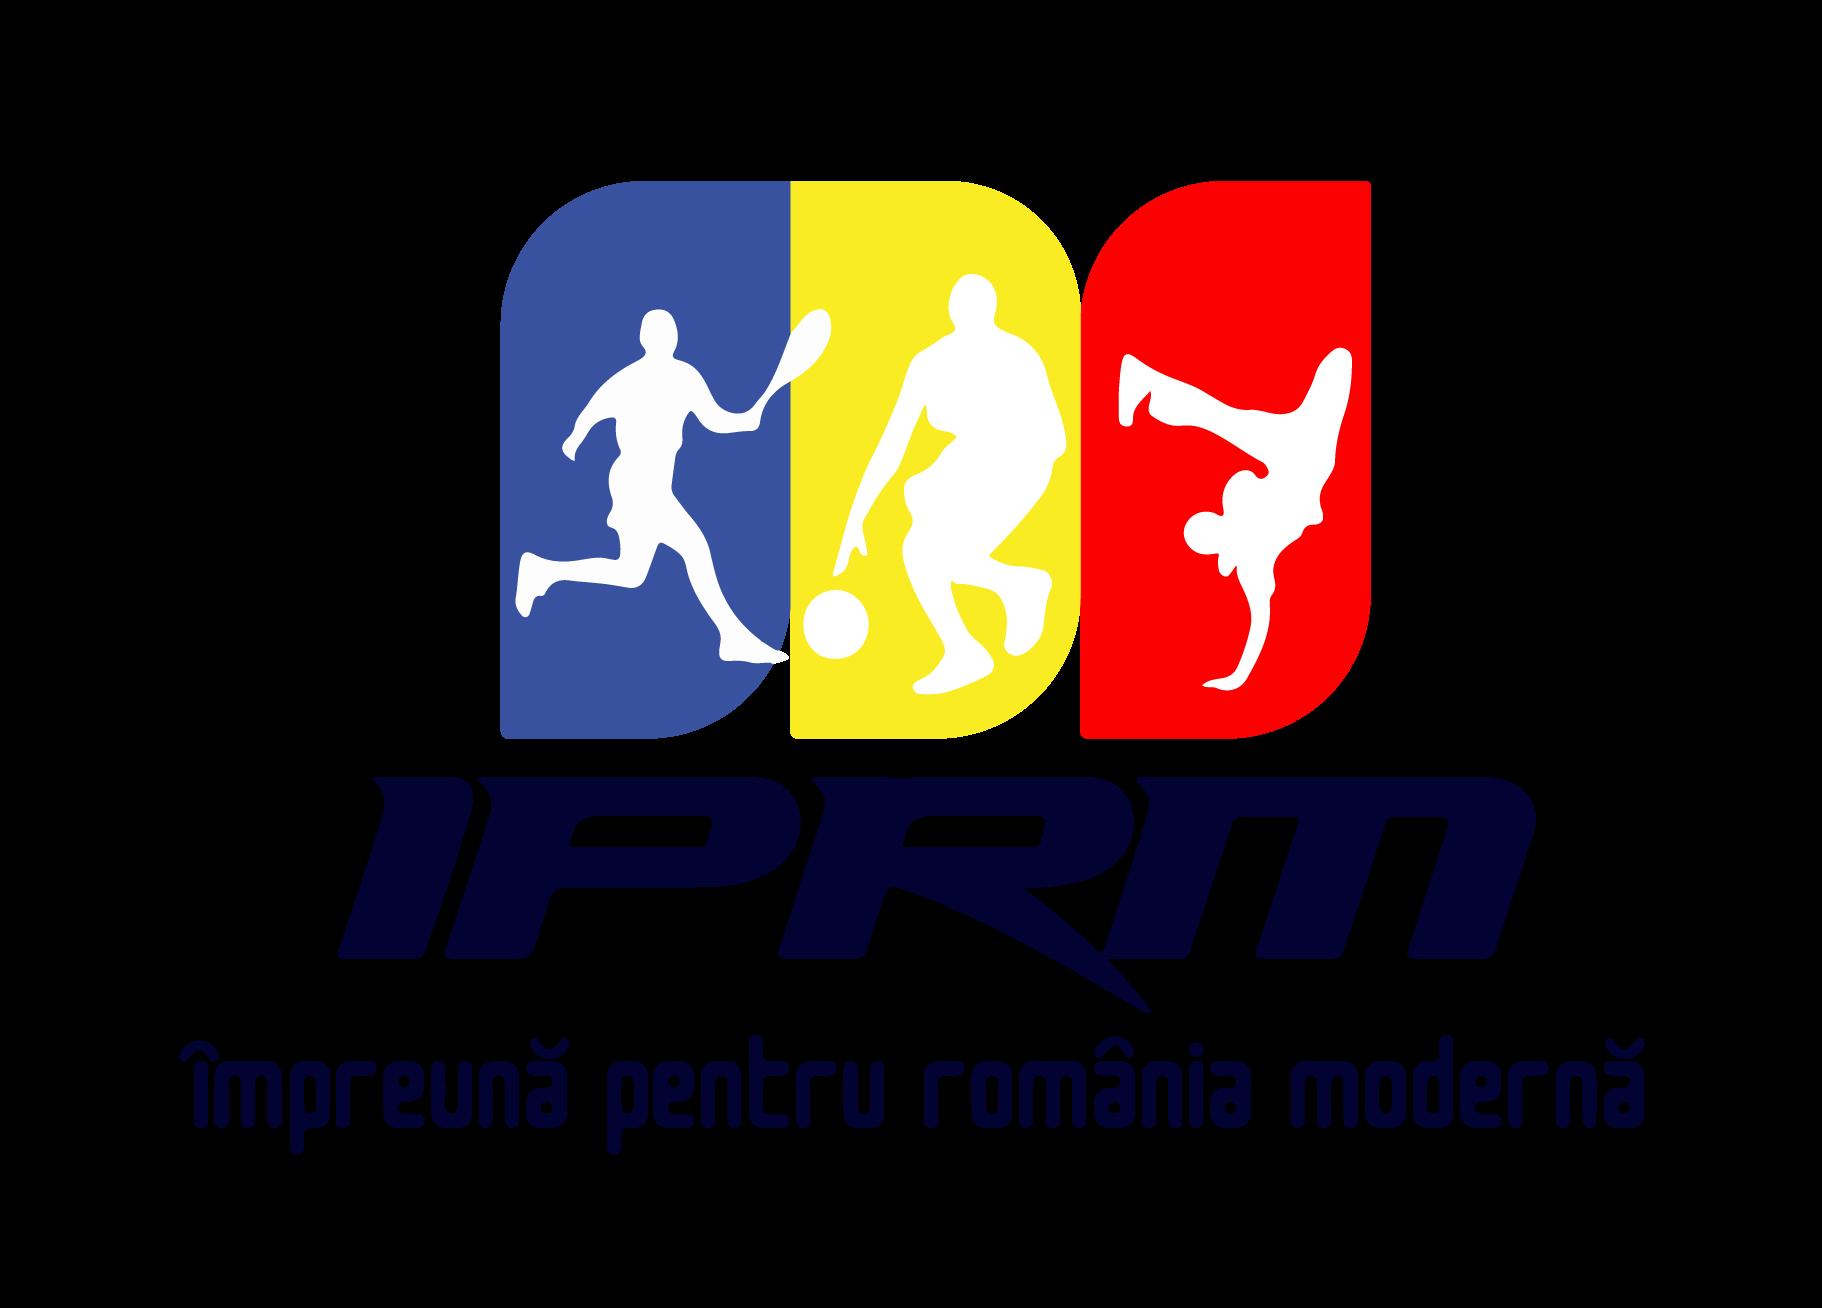 logo_iprm_color_fundal_transparent213q